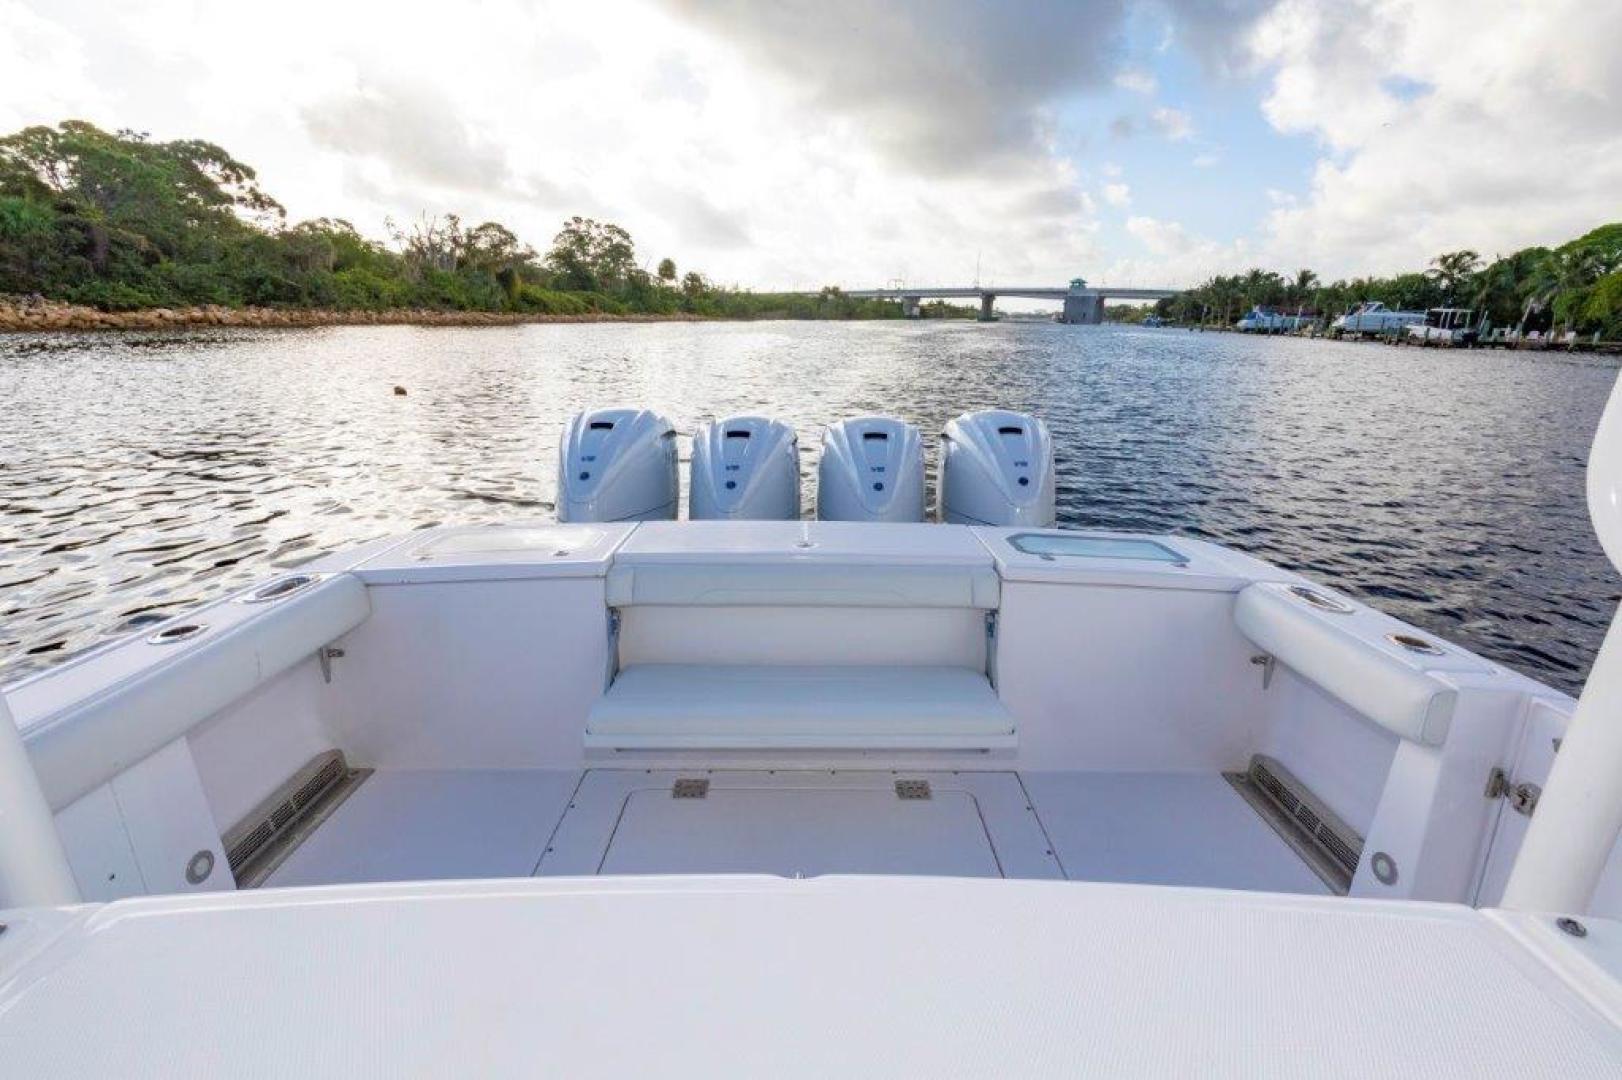 Everglades-435 Center Console 2019-Bahama Papa Palm Beach Gardens-Florida-United States-Deck-1570510 | Thumbnail